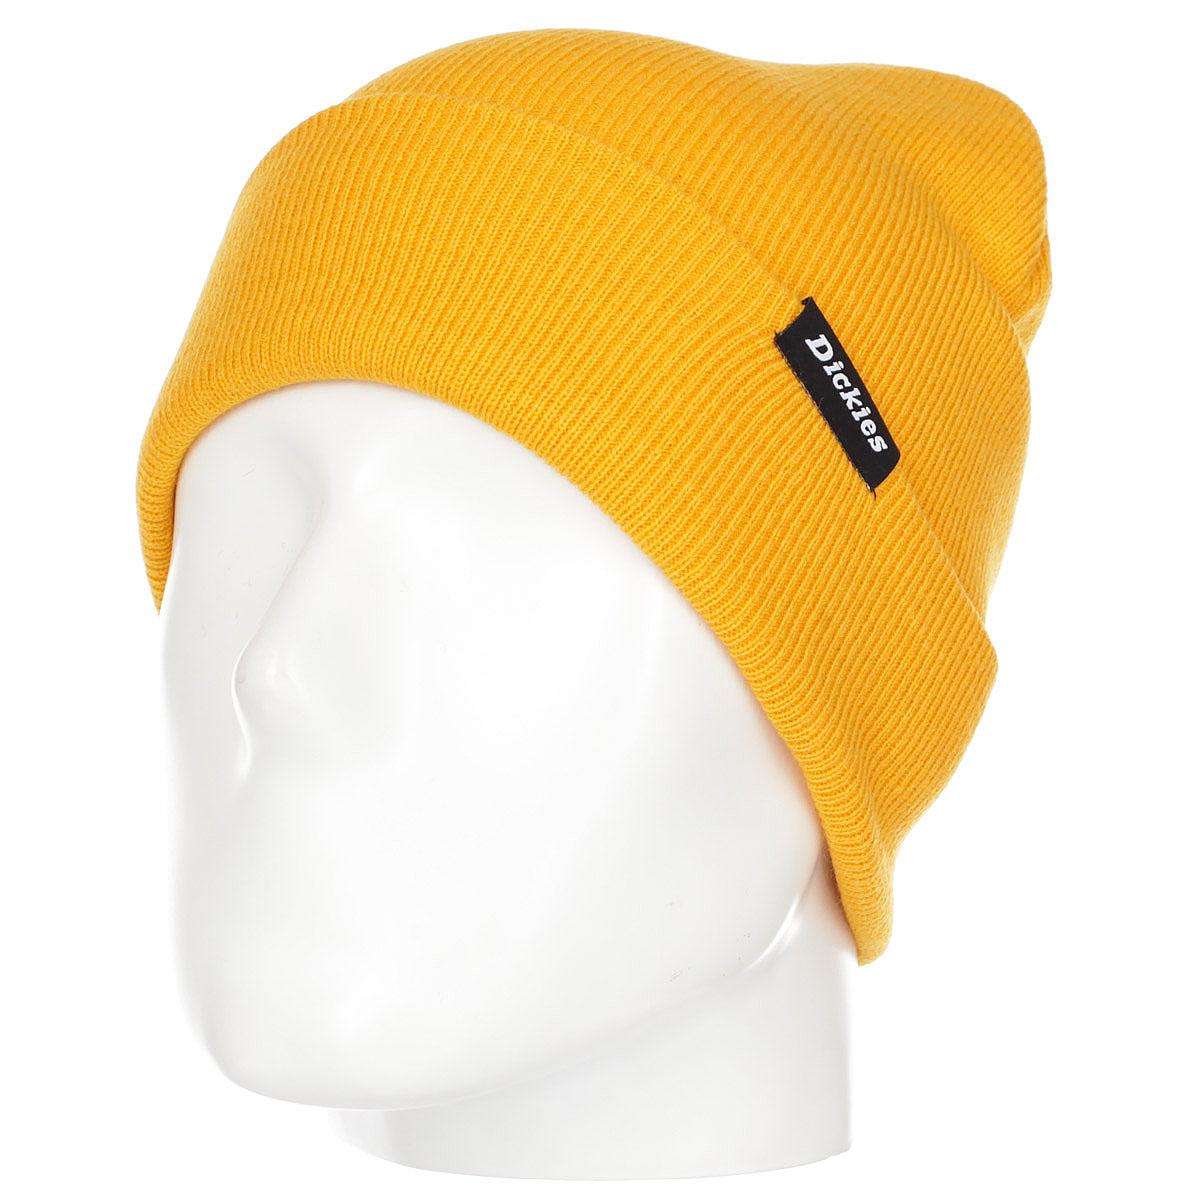 Alaska Beanie in Gold Orange - Gold orange Dickies D8ffmX